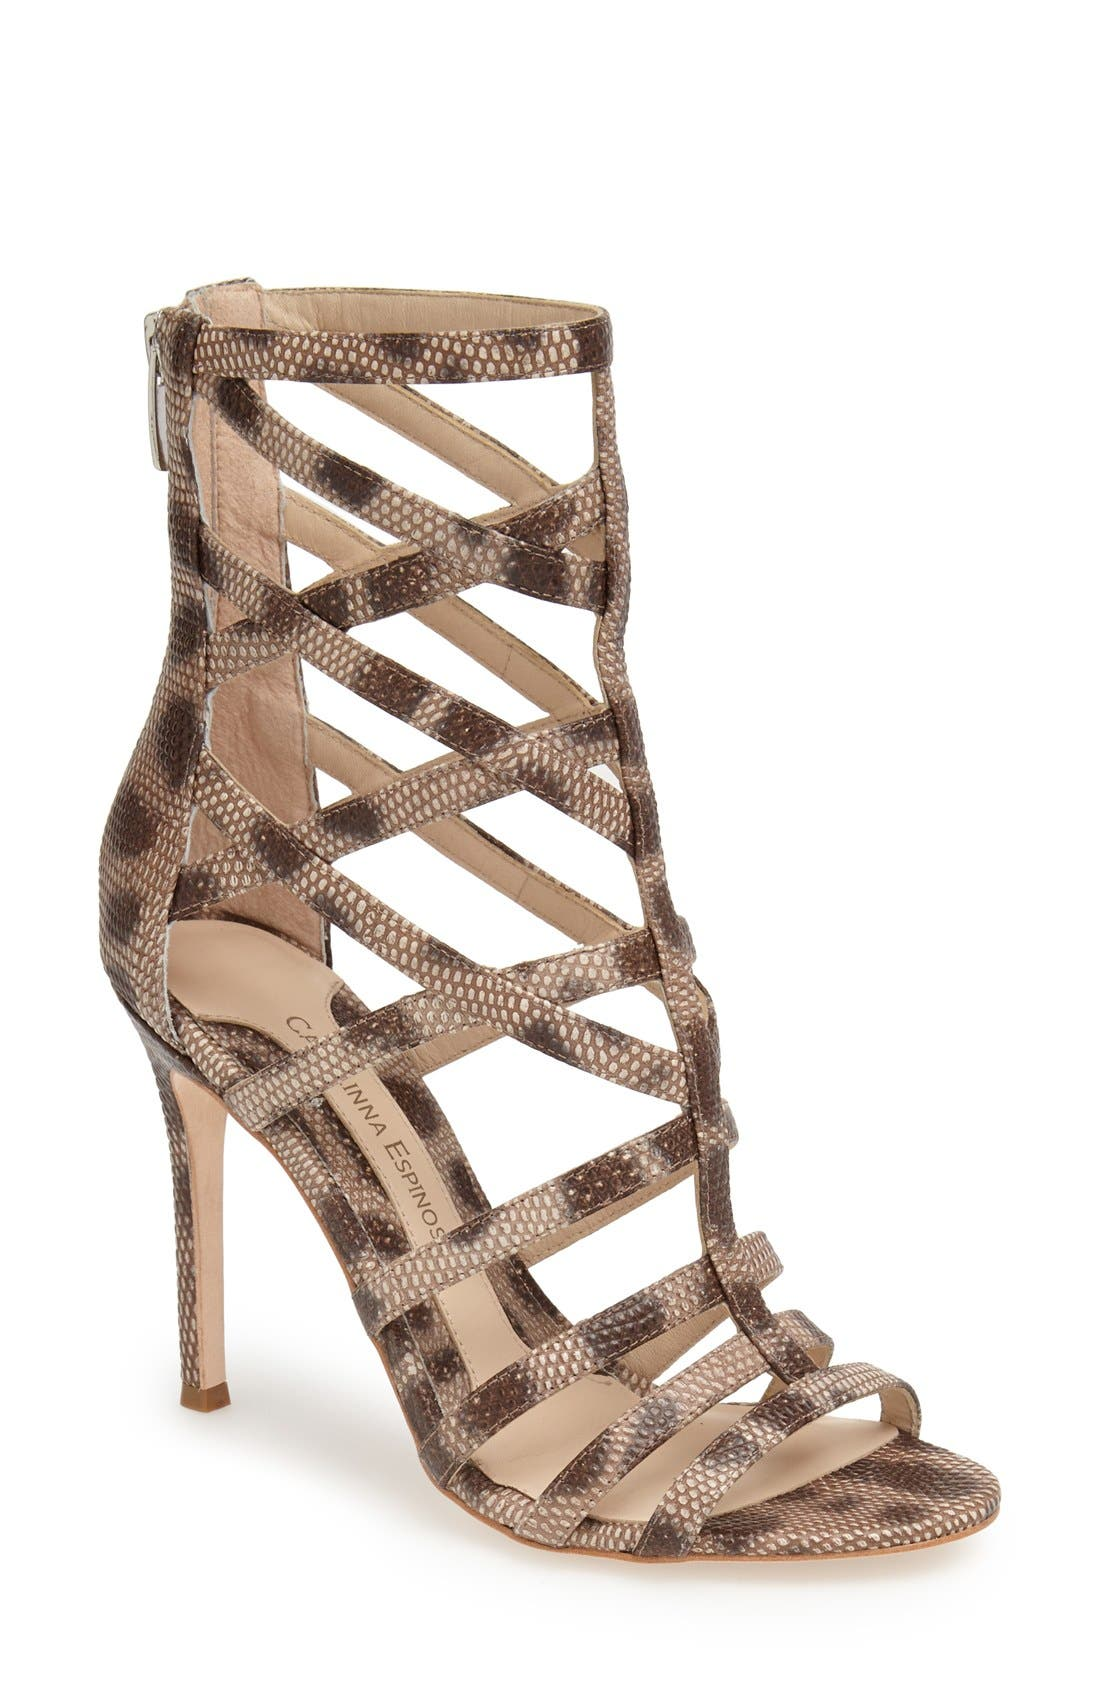 Main Image - Carolinna Espinosa 'Sari' Sandal